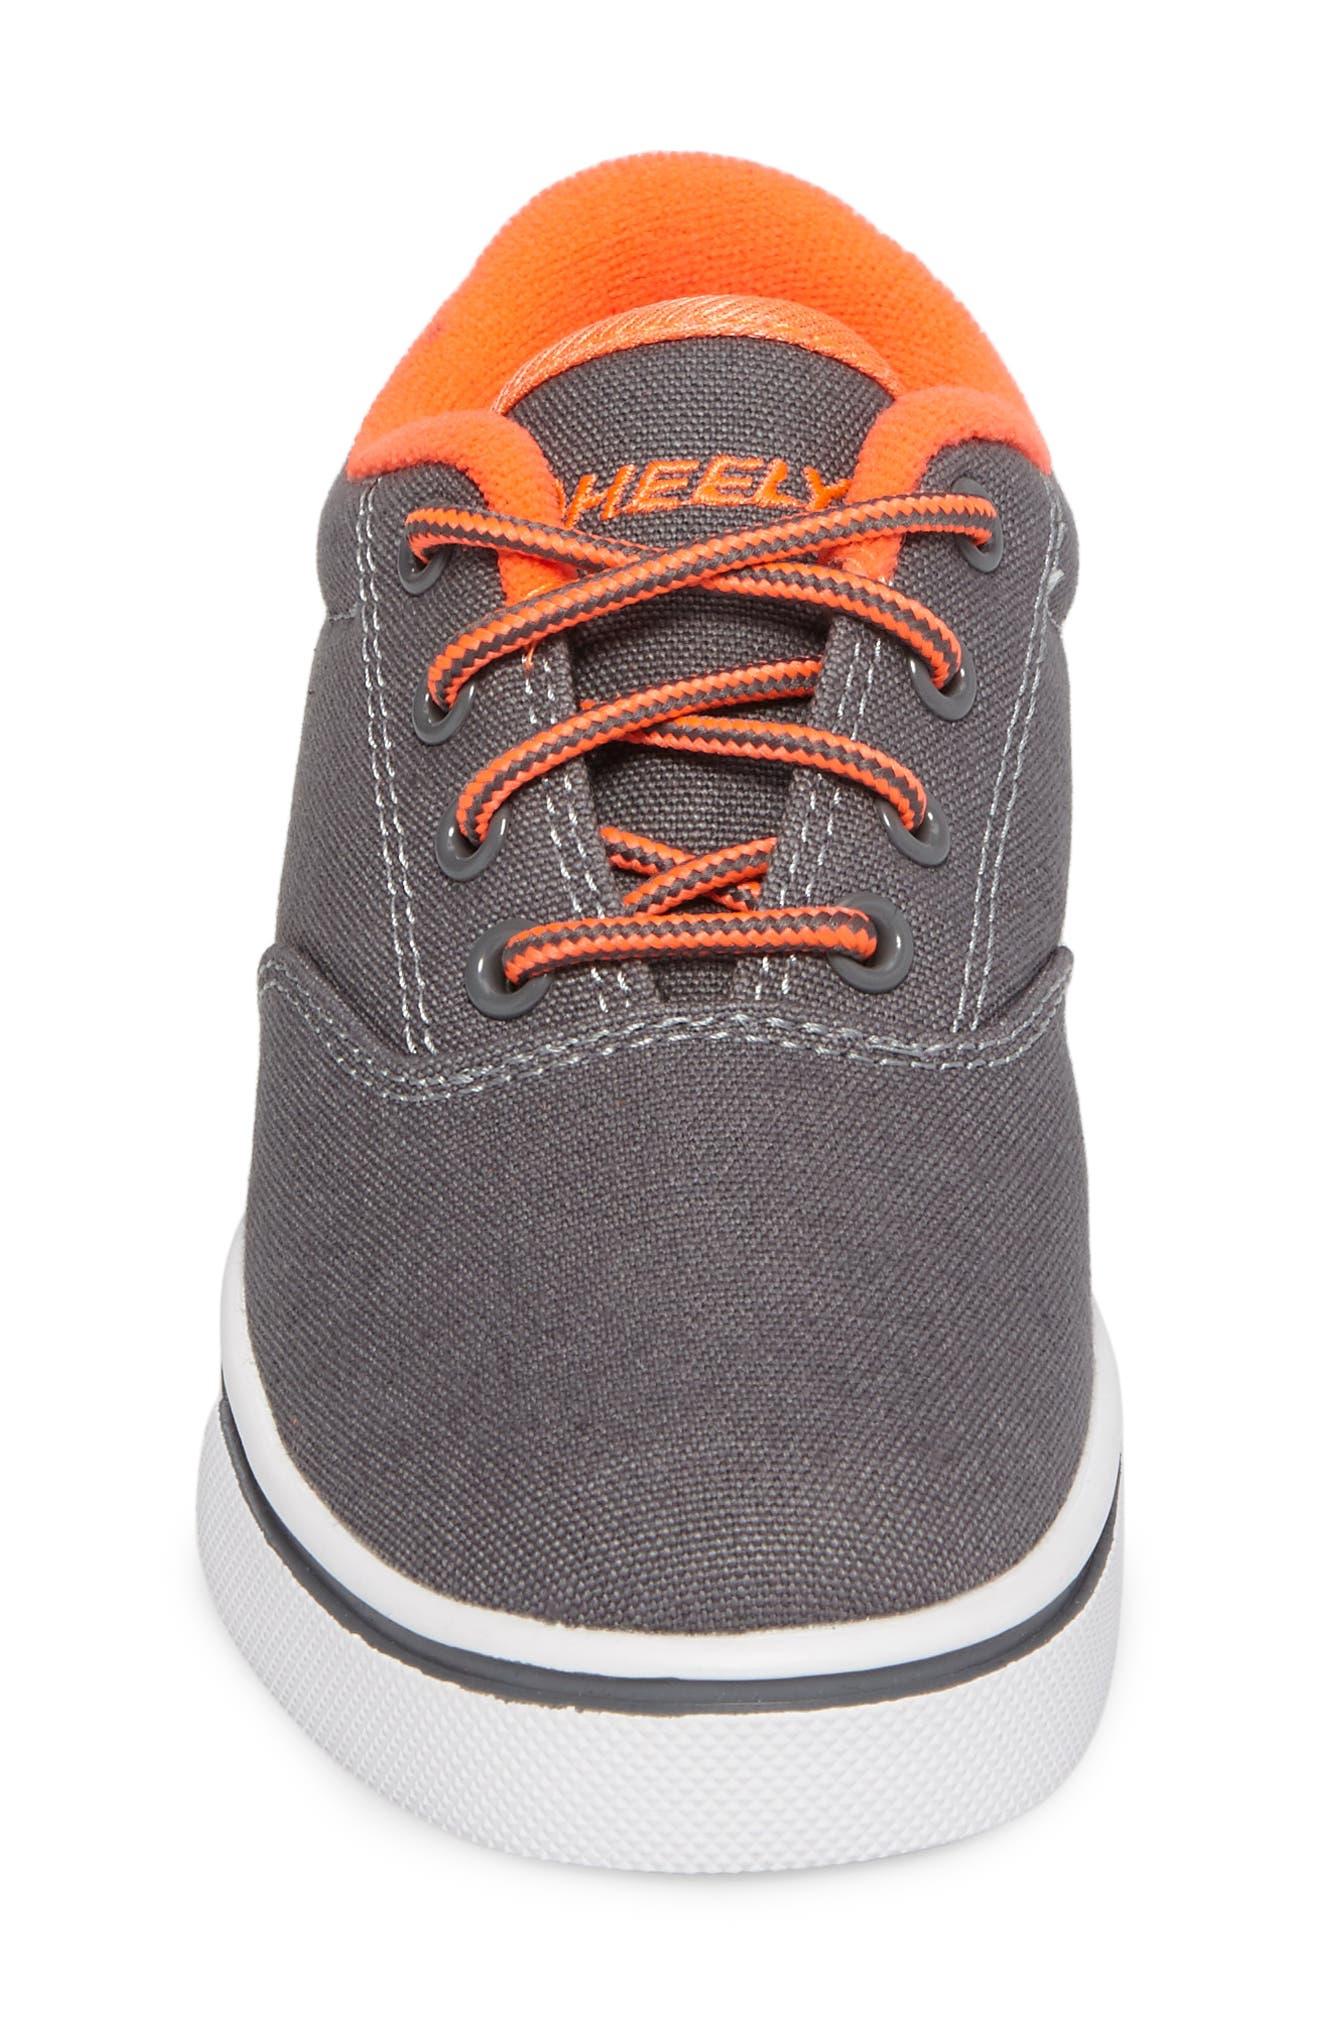 Alternate Image 4  - Heelys 'Launch' Skate Sneaker (Little Kid & Big Kid)